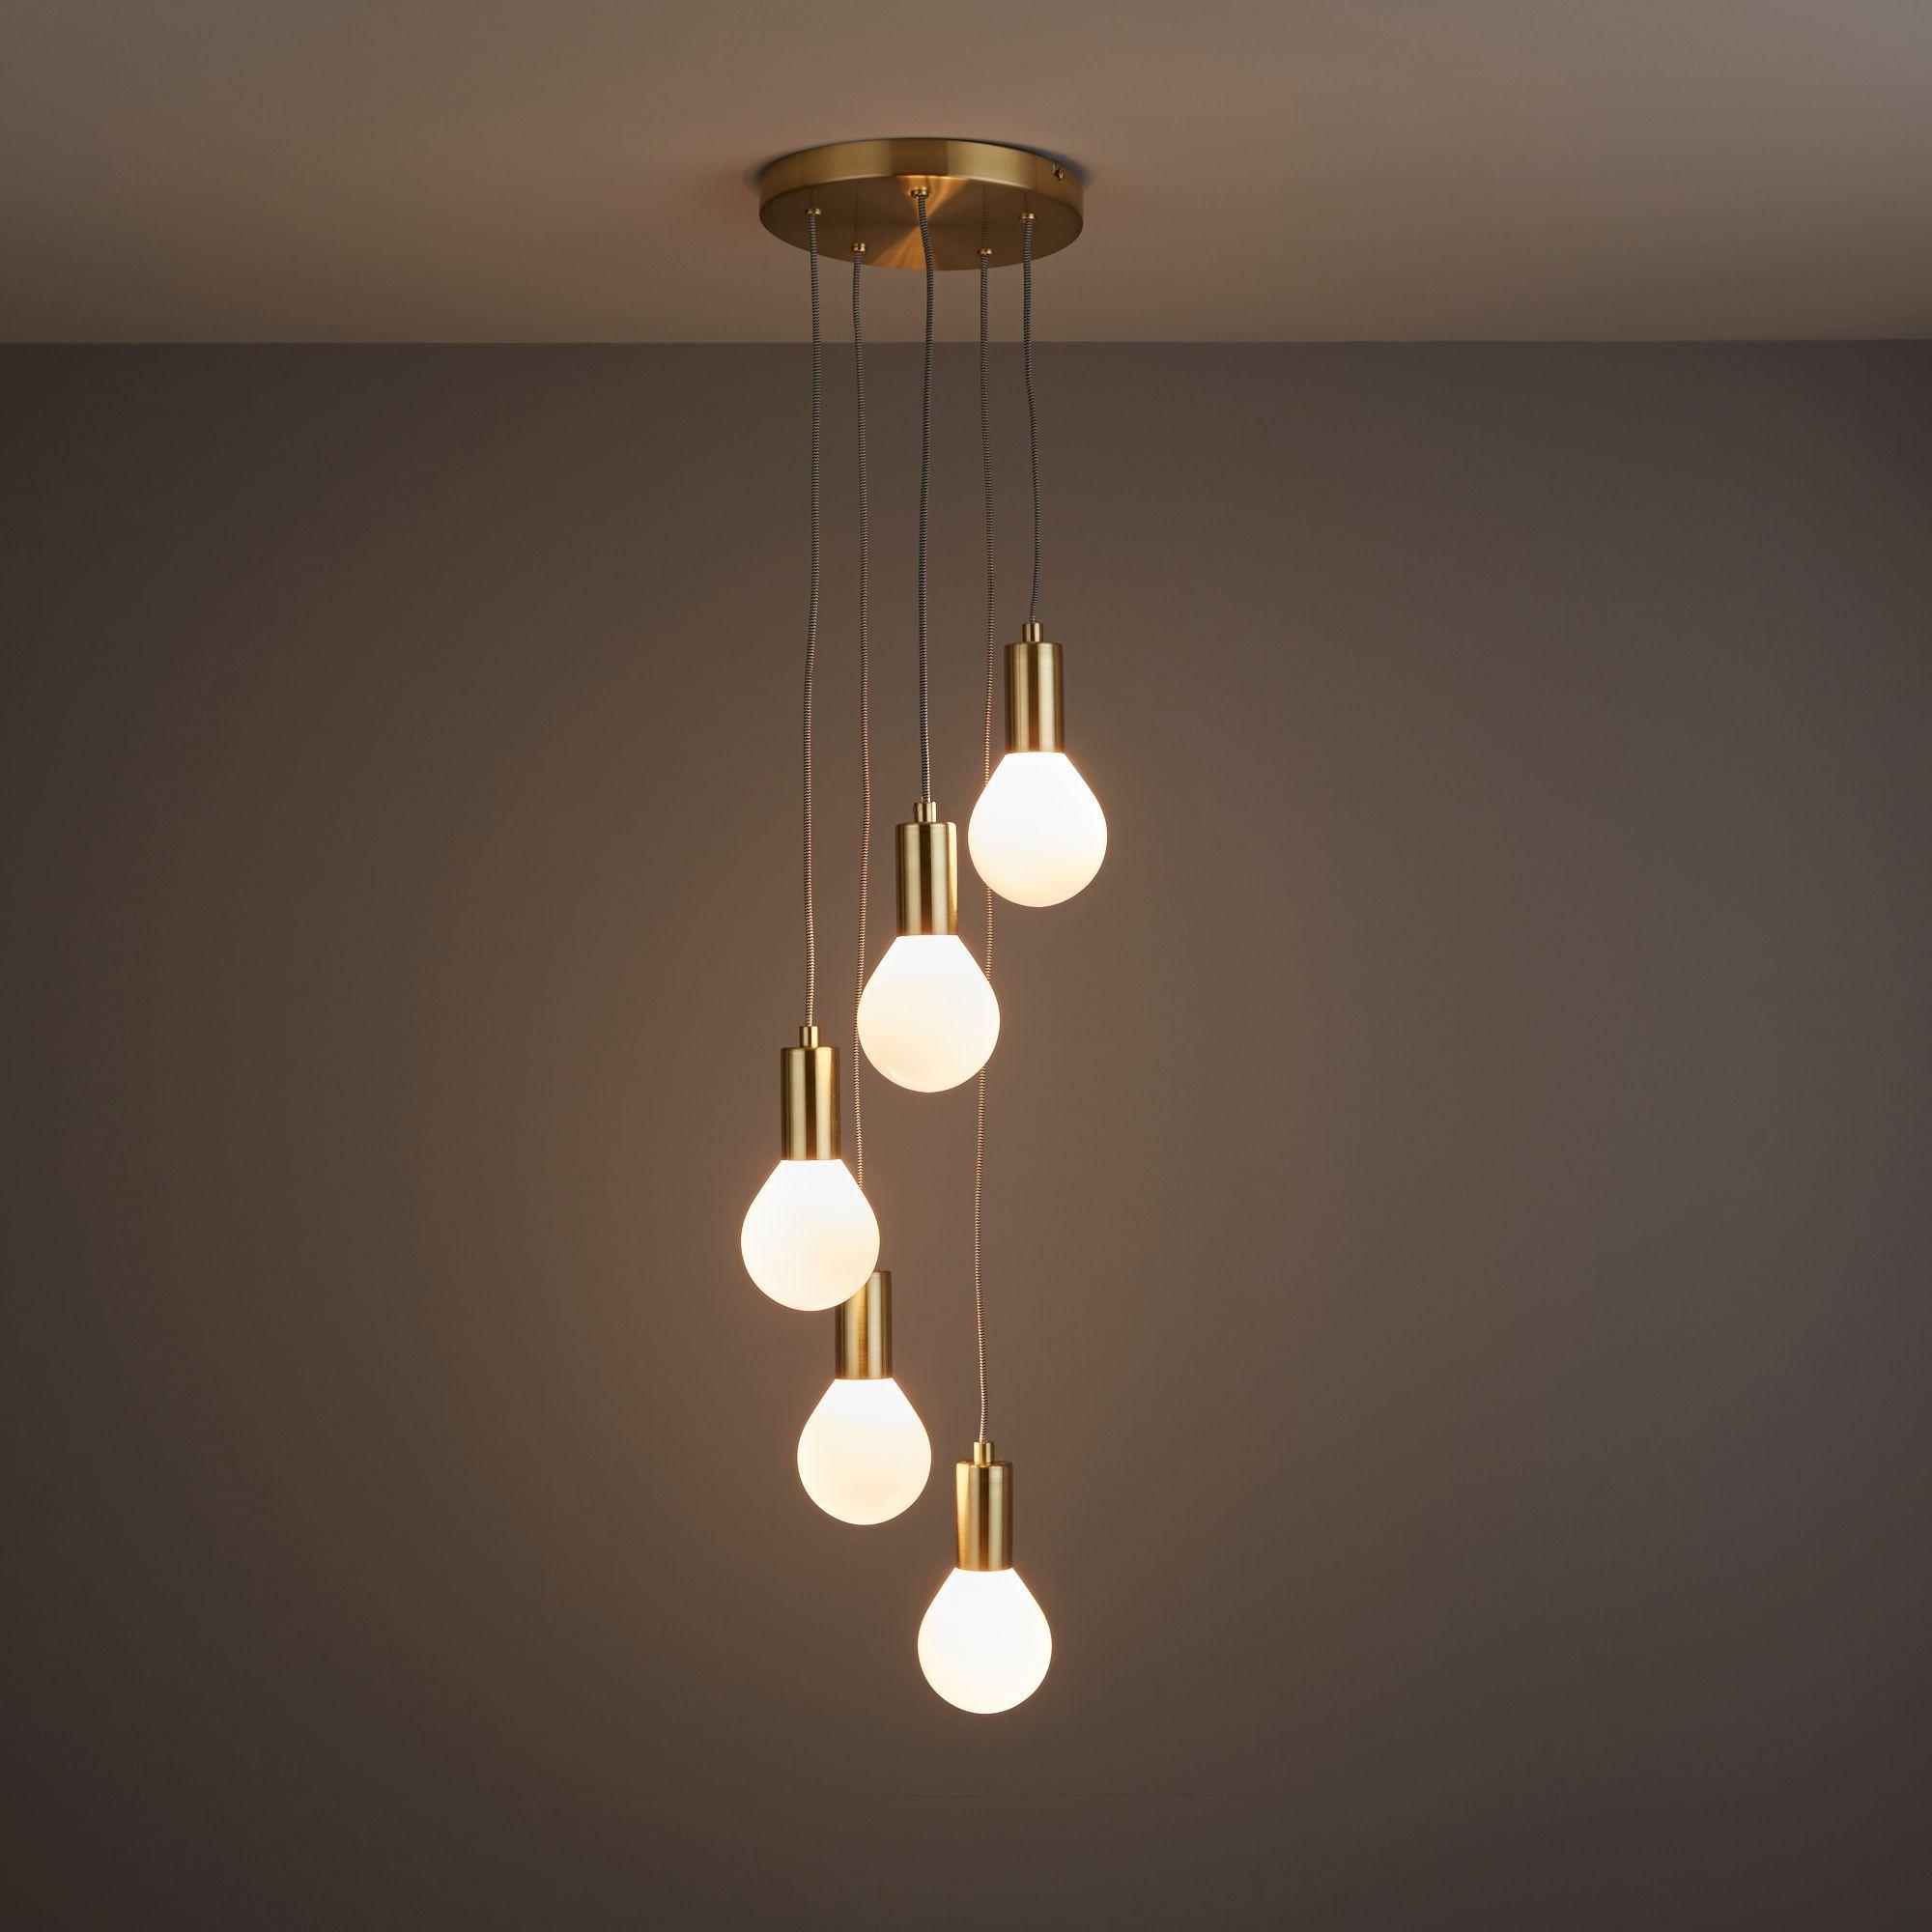 Channing Modern Gold Satin Brushed 5 Lamp Ceiling Light | Pinterest